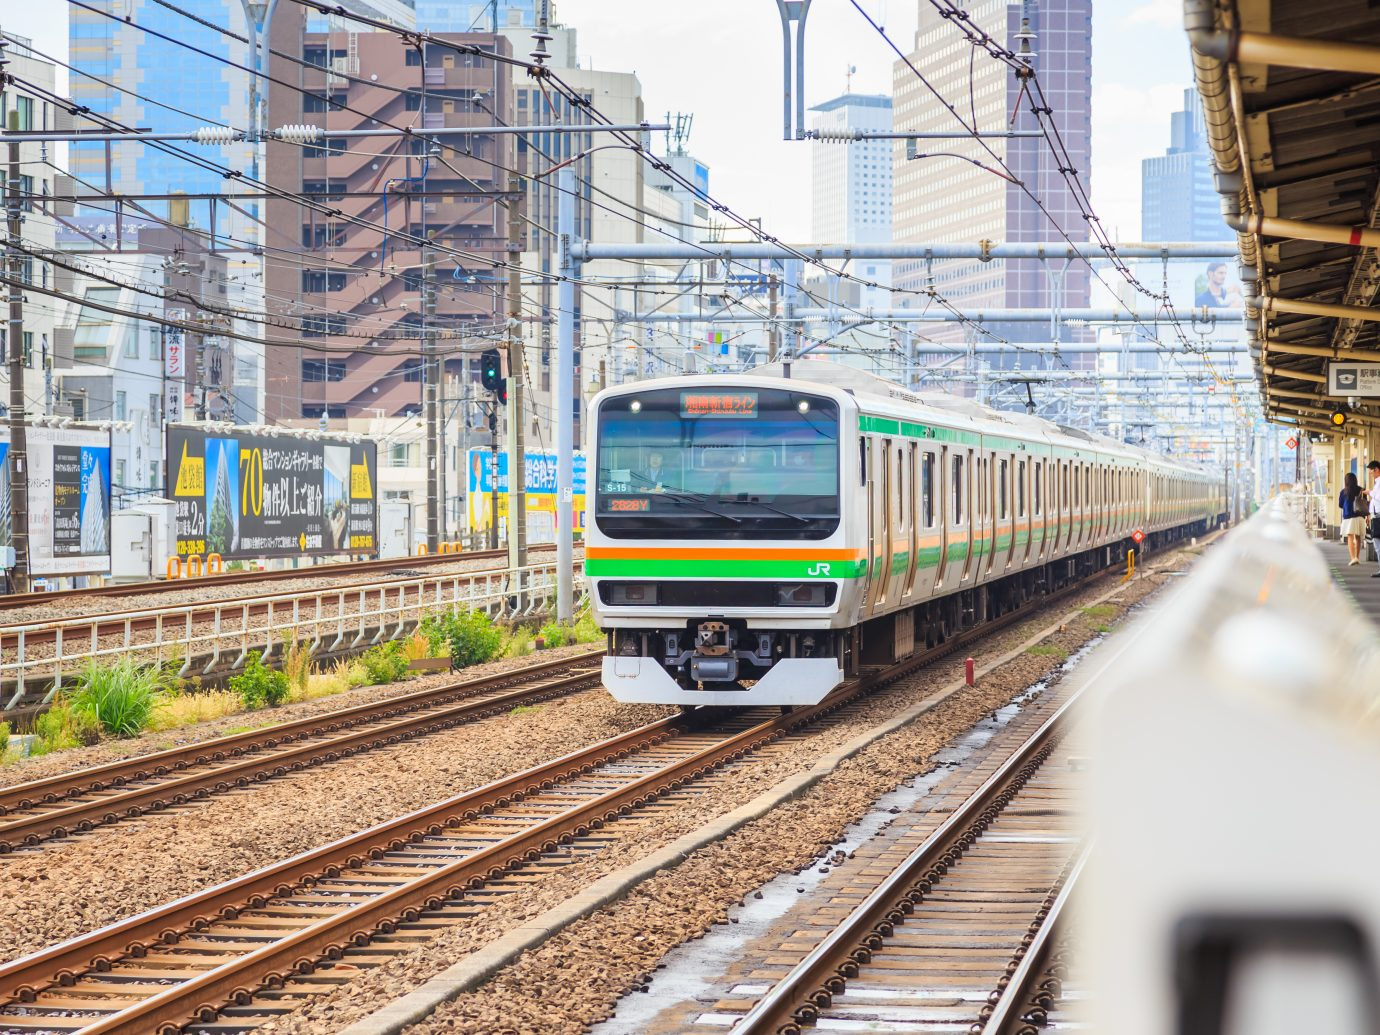 Tokyo, Japan - October 18, 2016 - JR train Yamanote line is the main transportation of people in Tokyo Japan